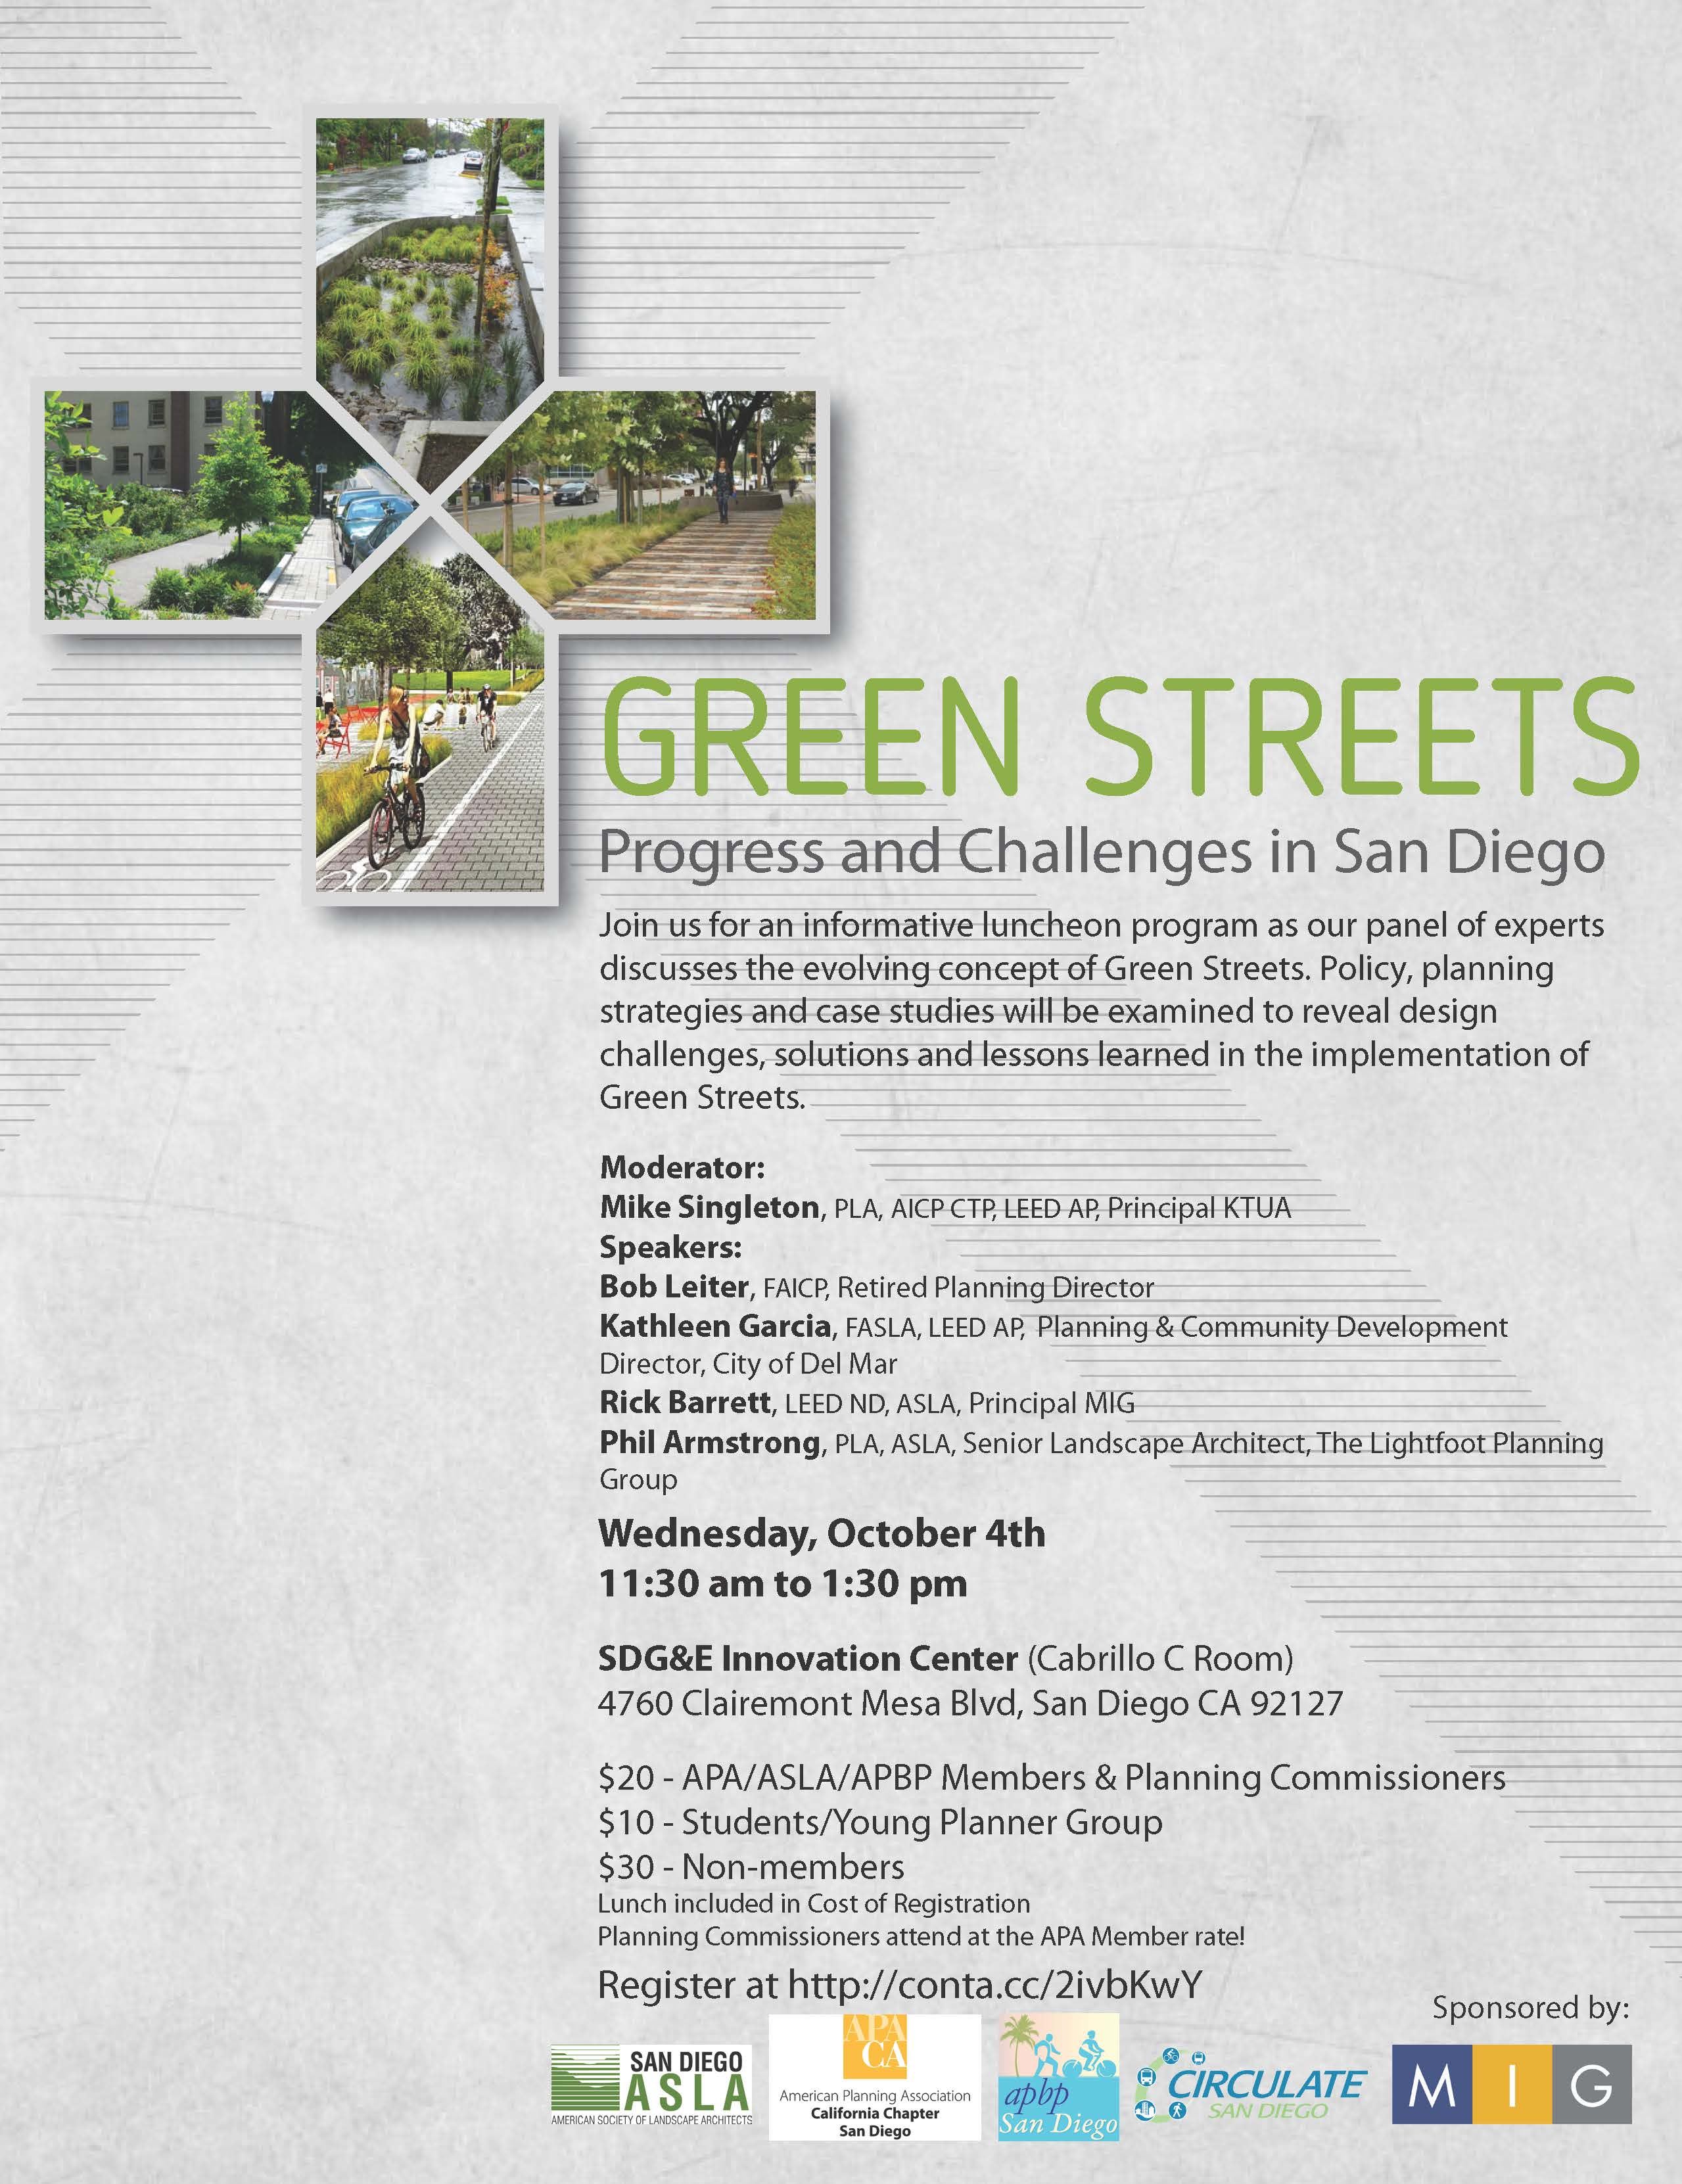 Green Streets Luncheon Circulate San Diego